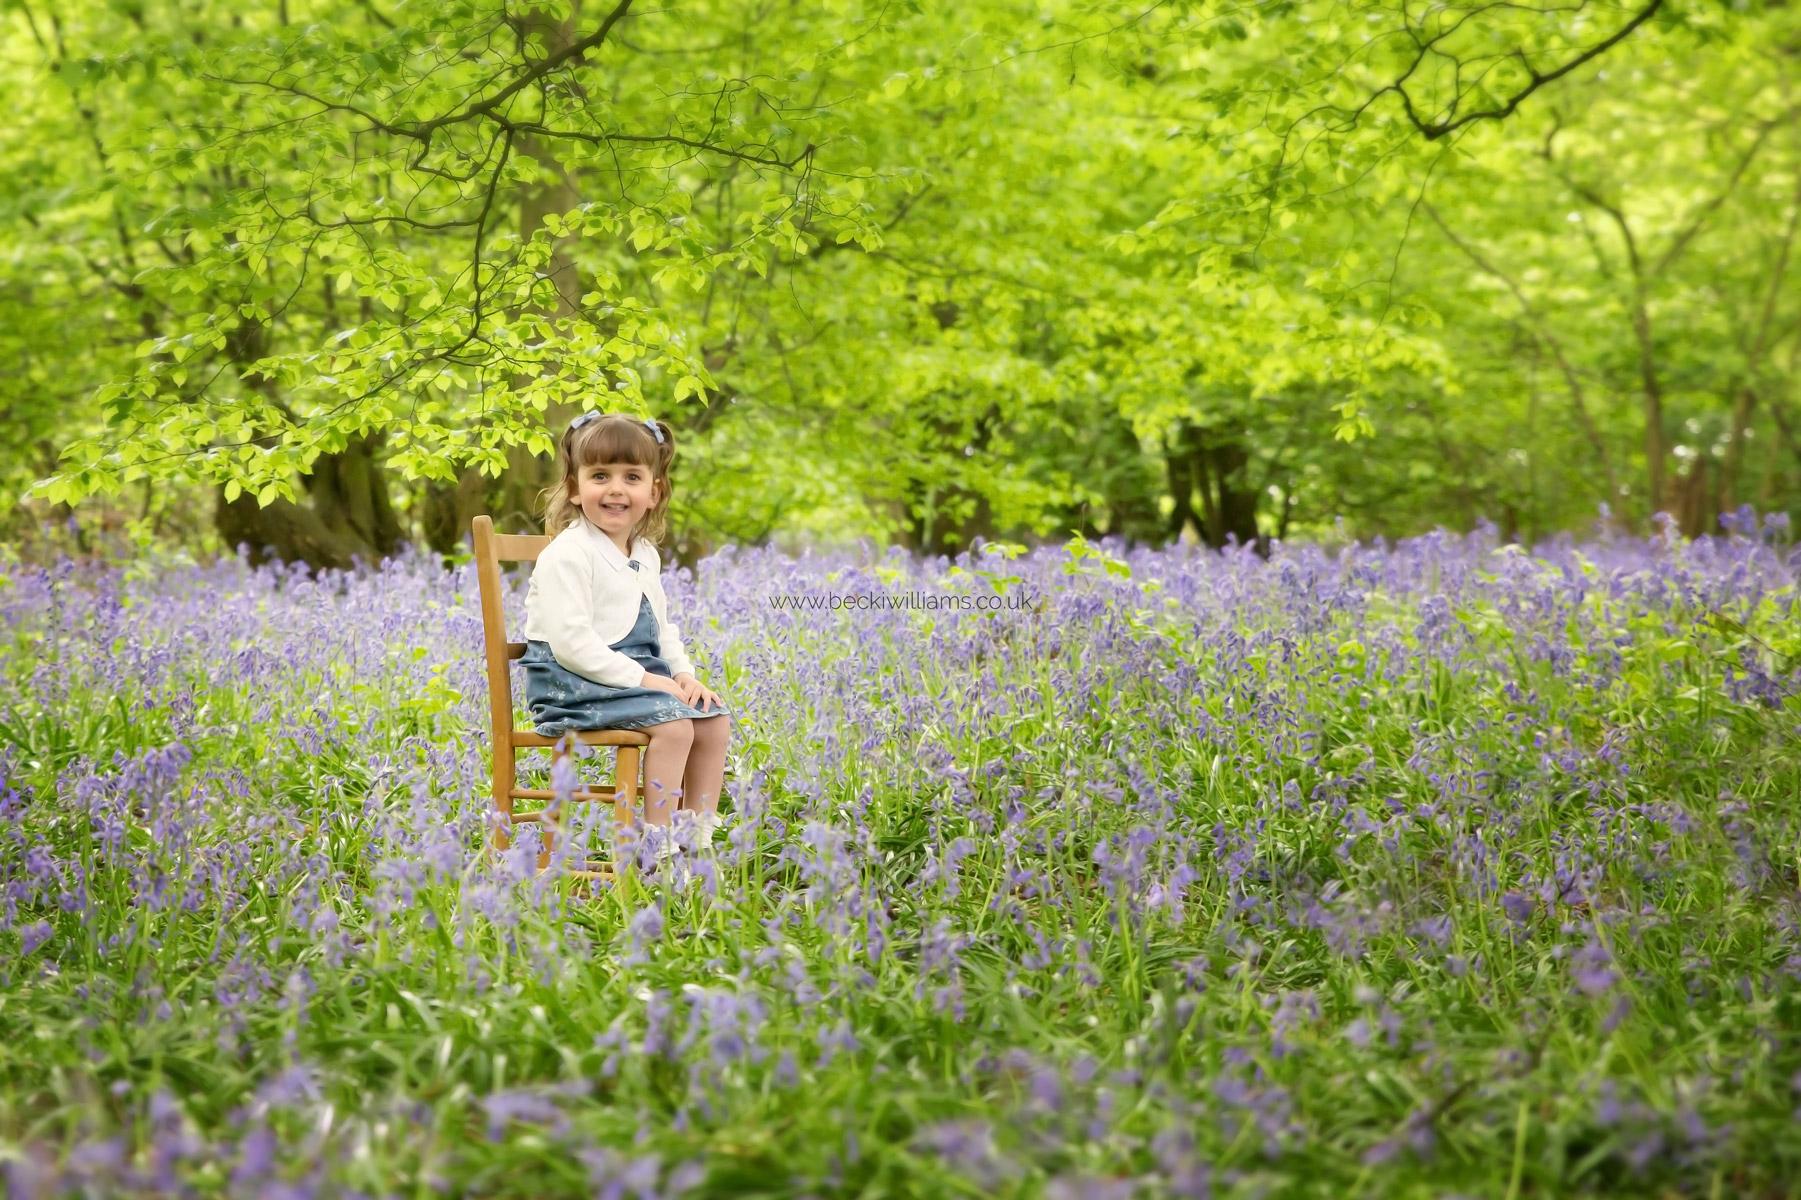 bluebells-st-albans-becki-williams-photography-21.jpg